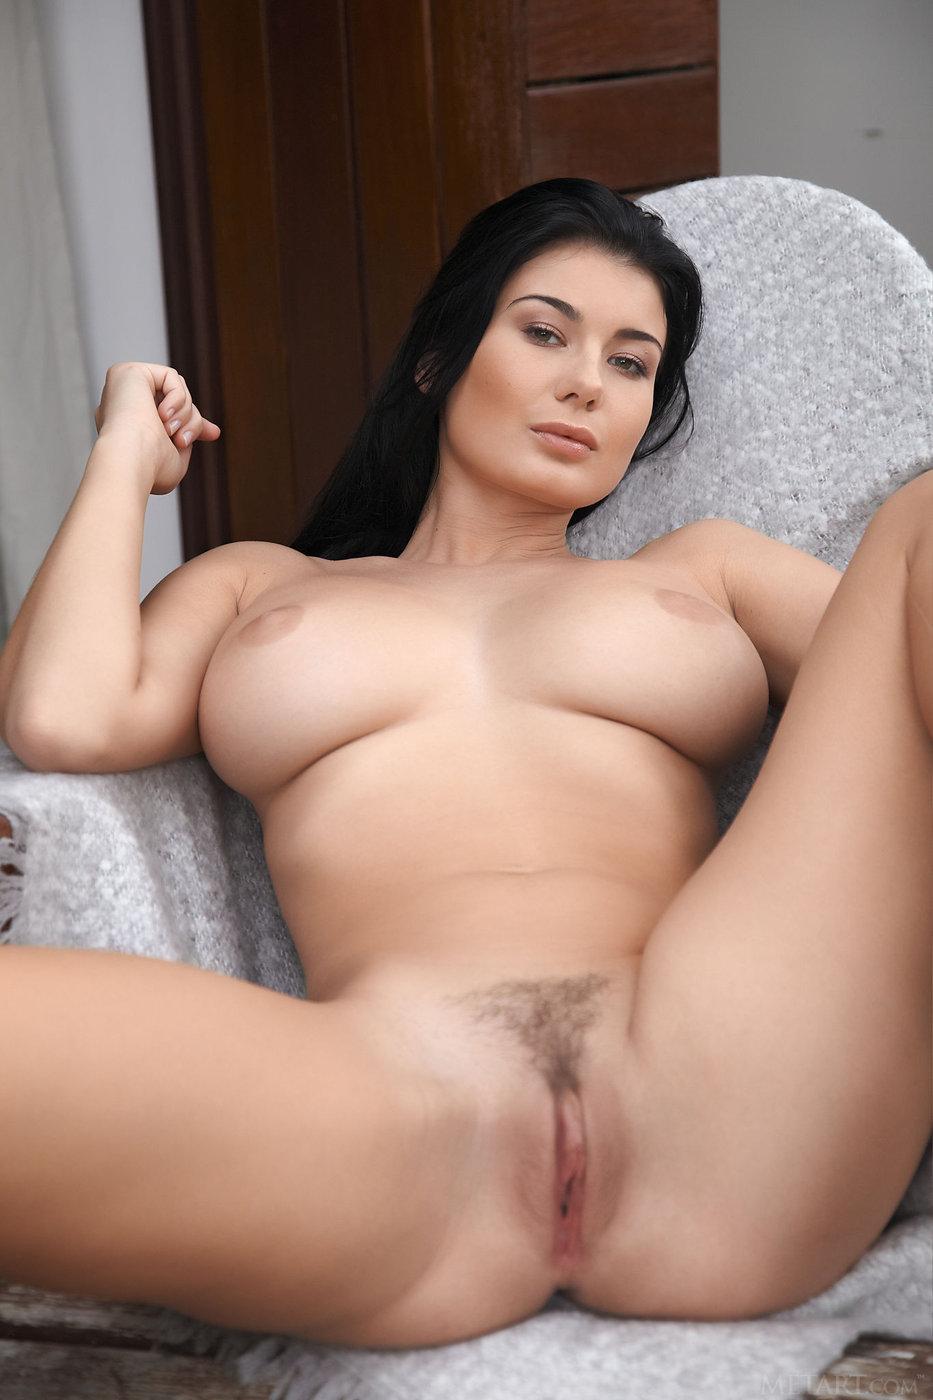 Tear soha nude photos ass pussy boobs latin beauties japanesse